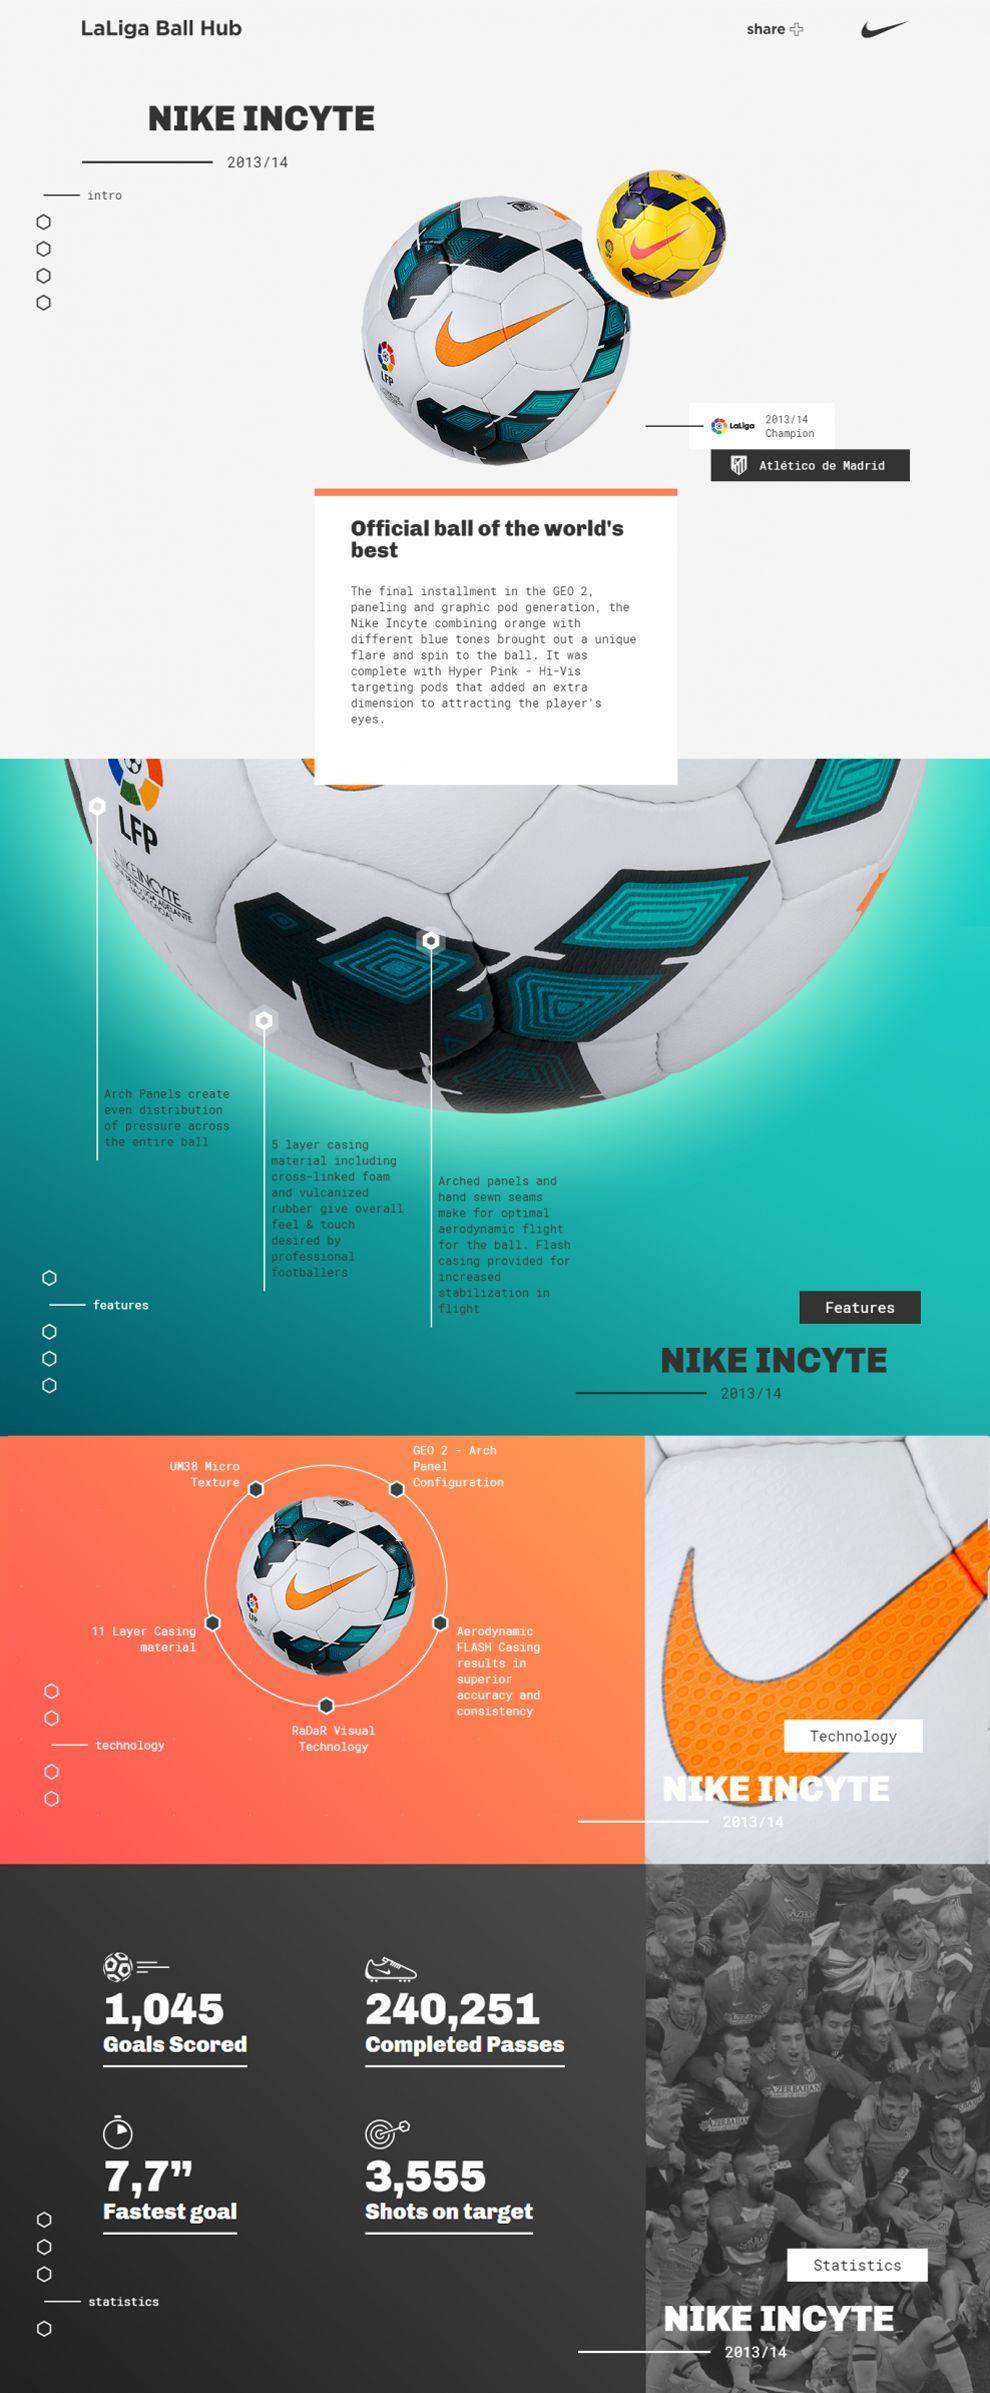 La Liga - Nike Ball Hub Colorful Website Design